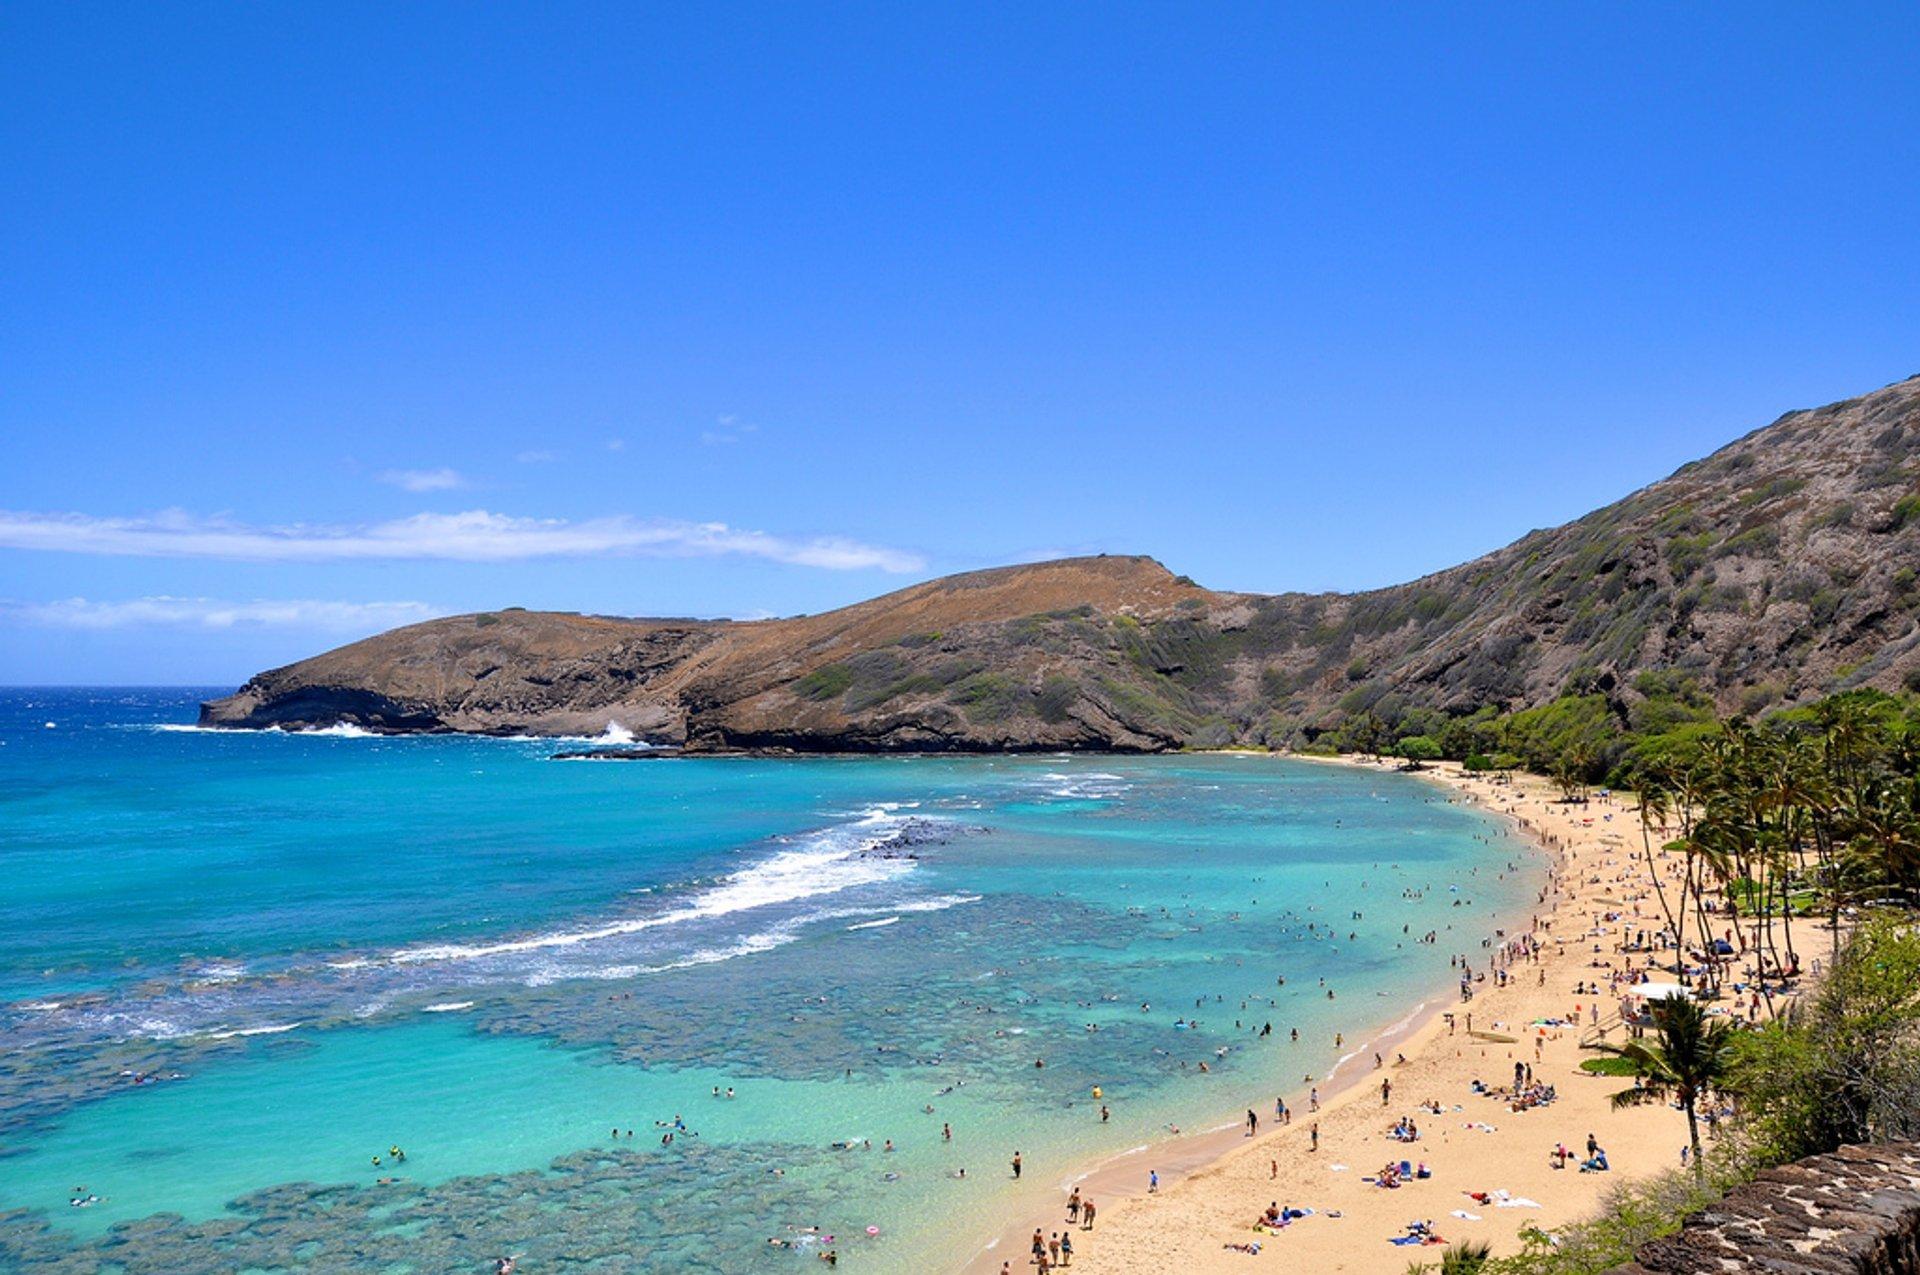 Hanauma Bay Nature Preserve in Hawaii 2019 - Best Time